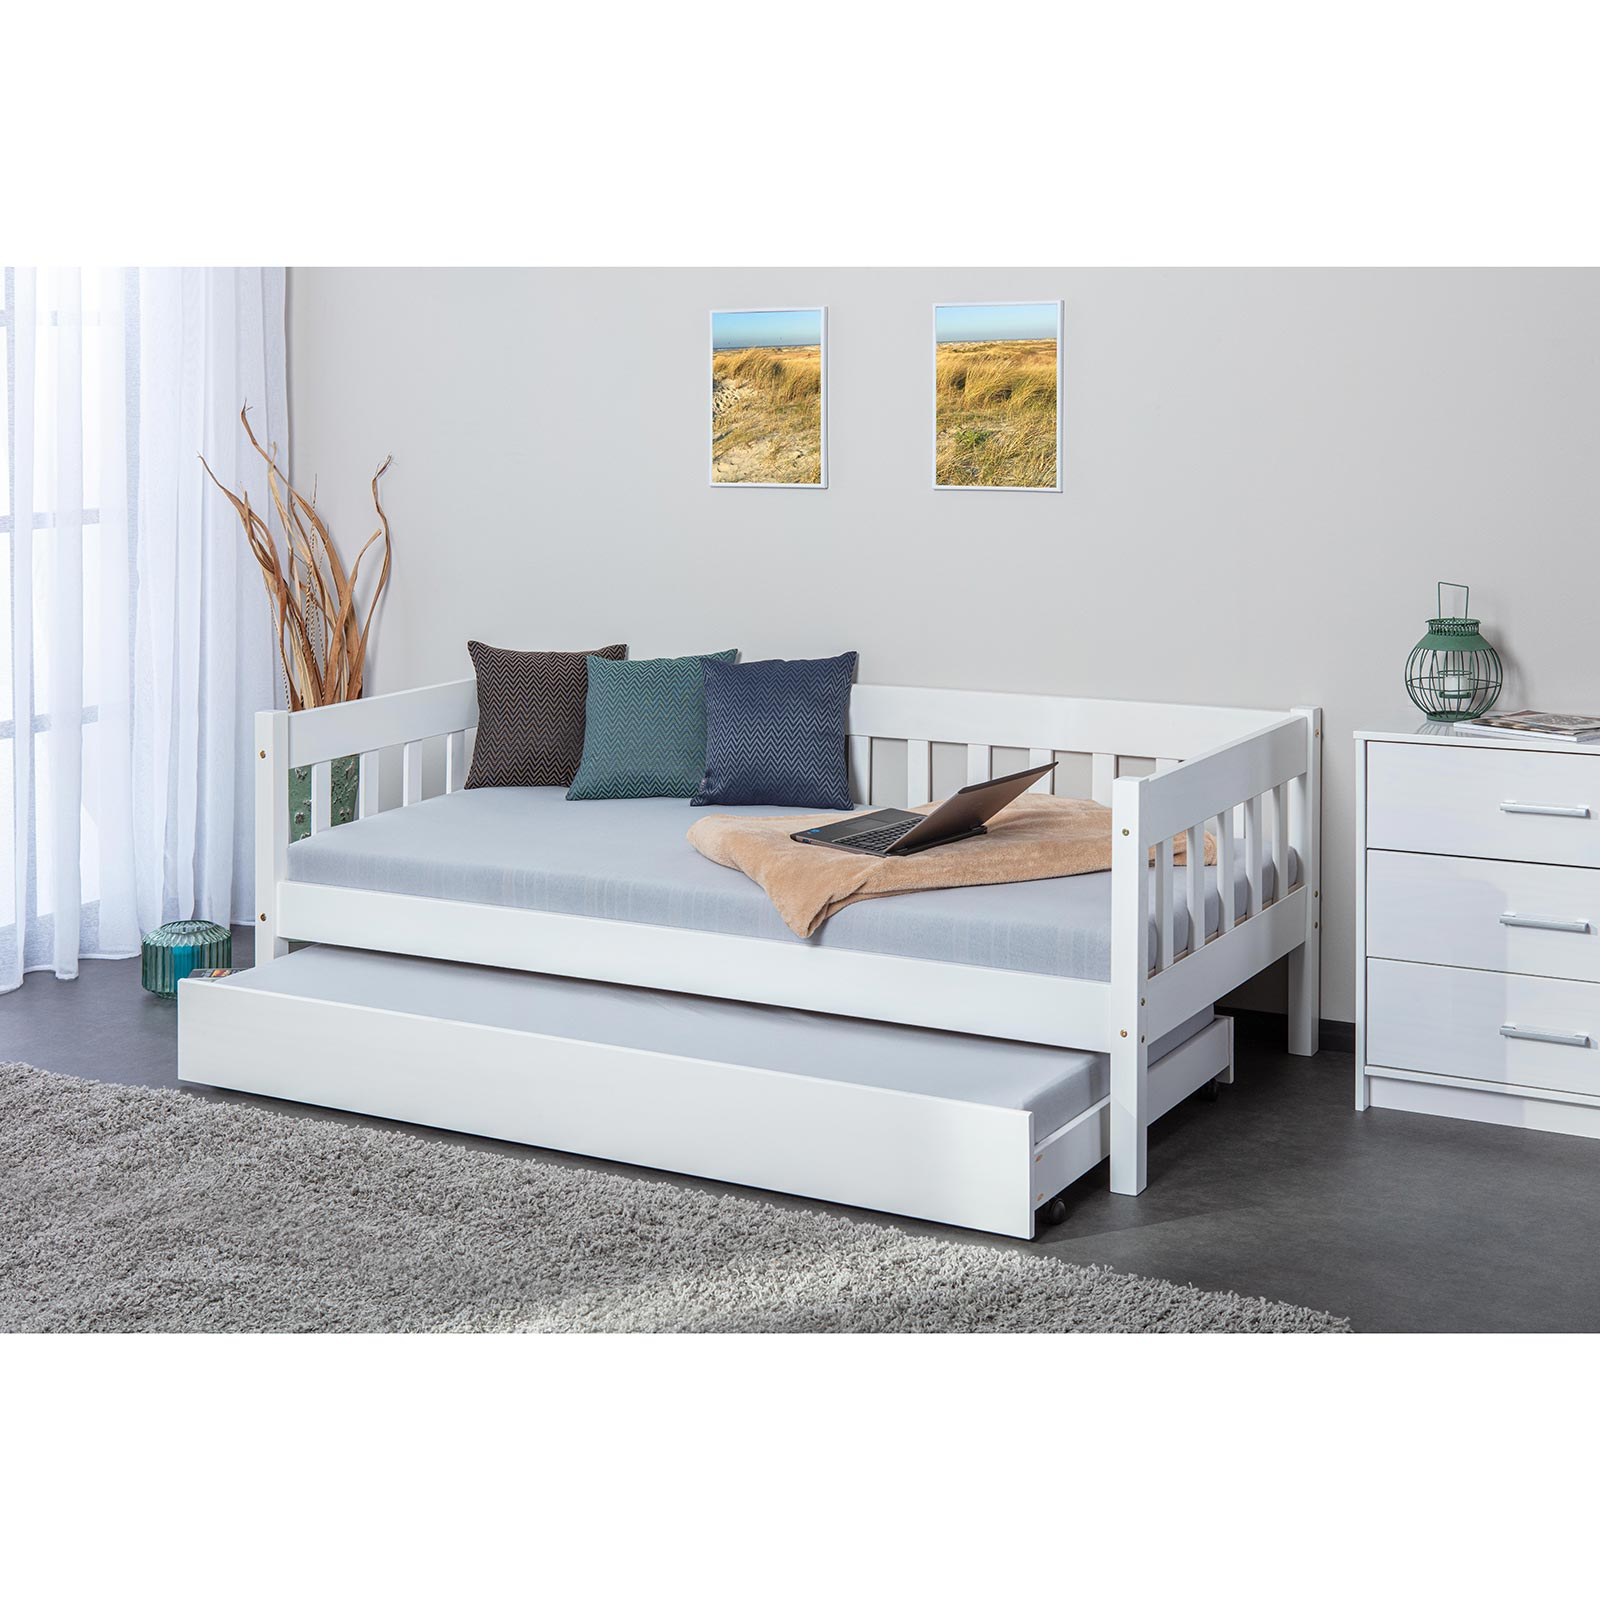 Bett SINTRO - weiß - Kiefer massiv - 90x200 cm | Online ...